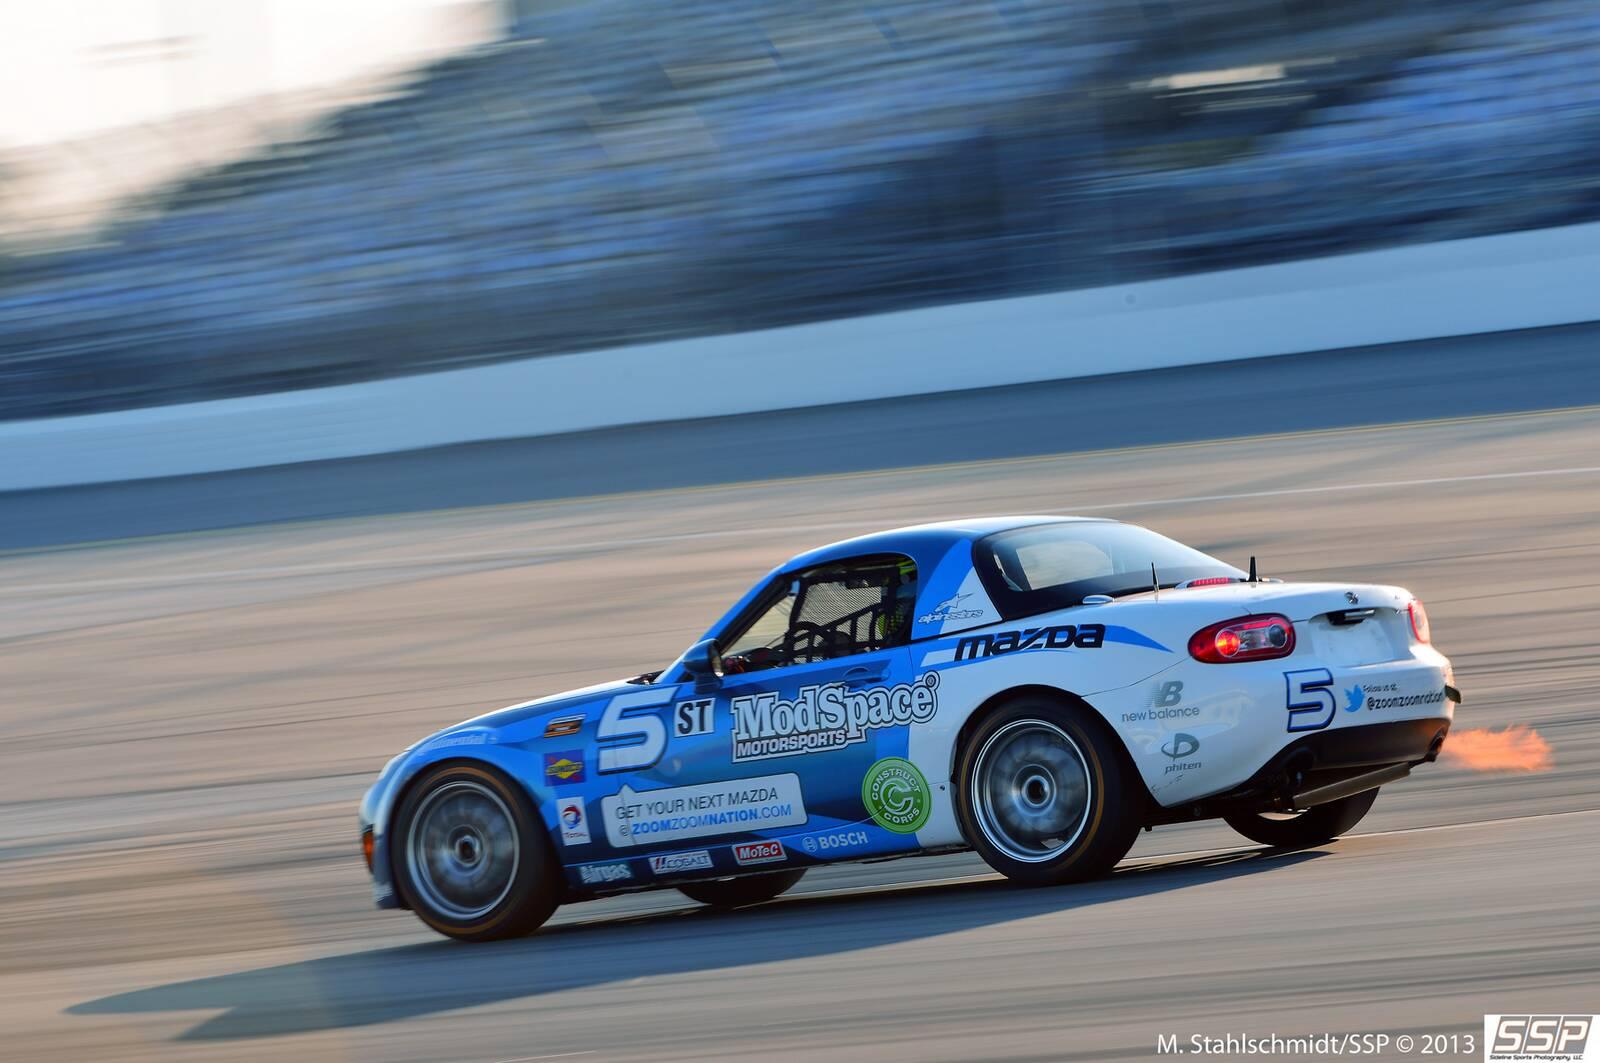 CJ Wilson: Racer, Pitcher, Petrolhead Part 1